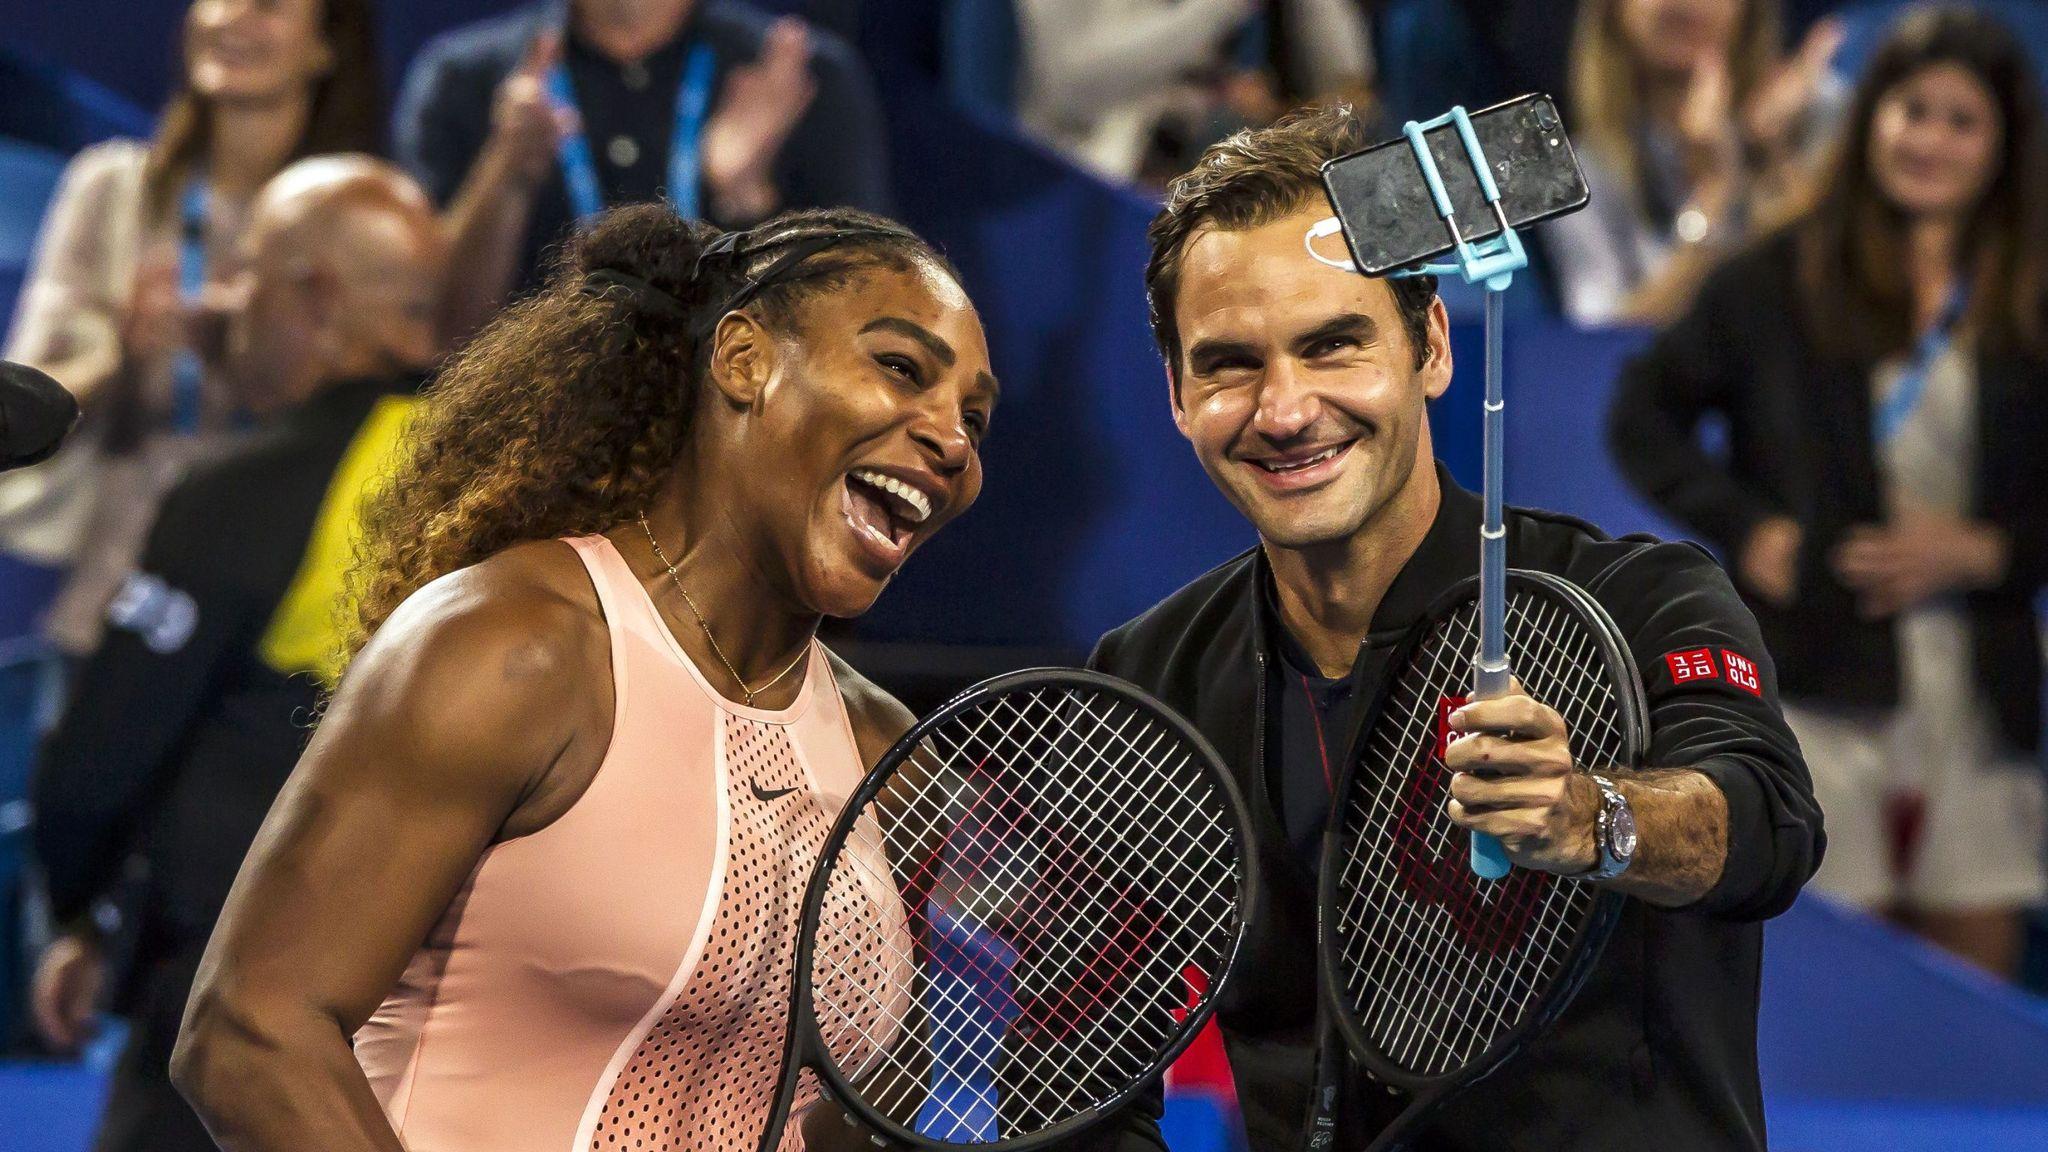 Roger Federer And Serena Williams Losing Precious Time Due To Coronavirus Pandemic Says Martina Navratilova Tennis News Sky Sports